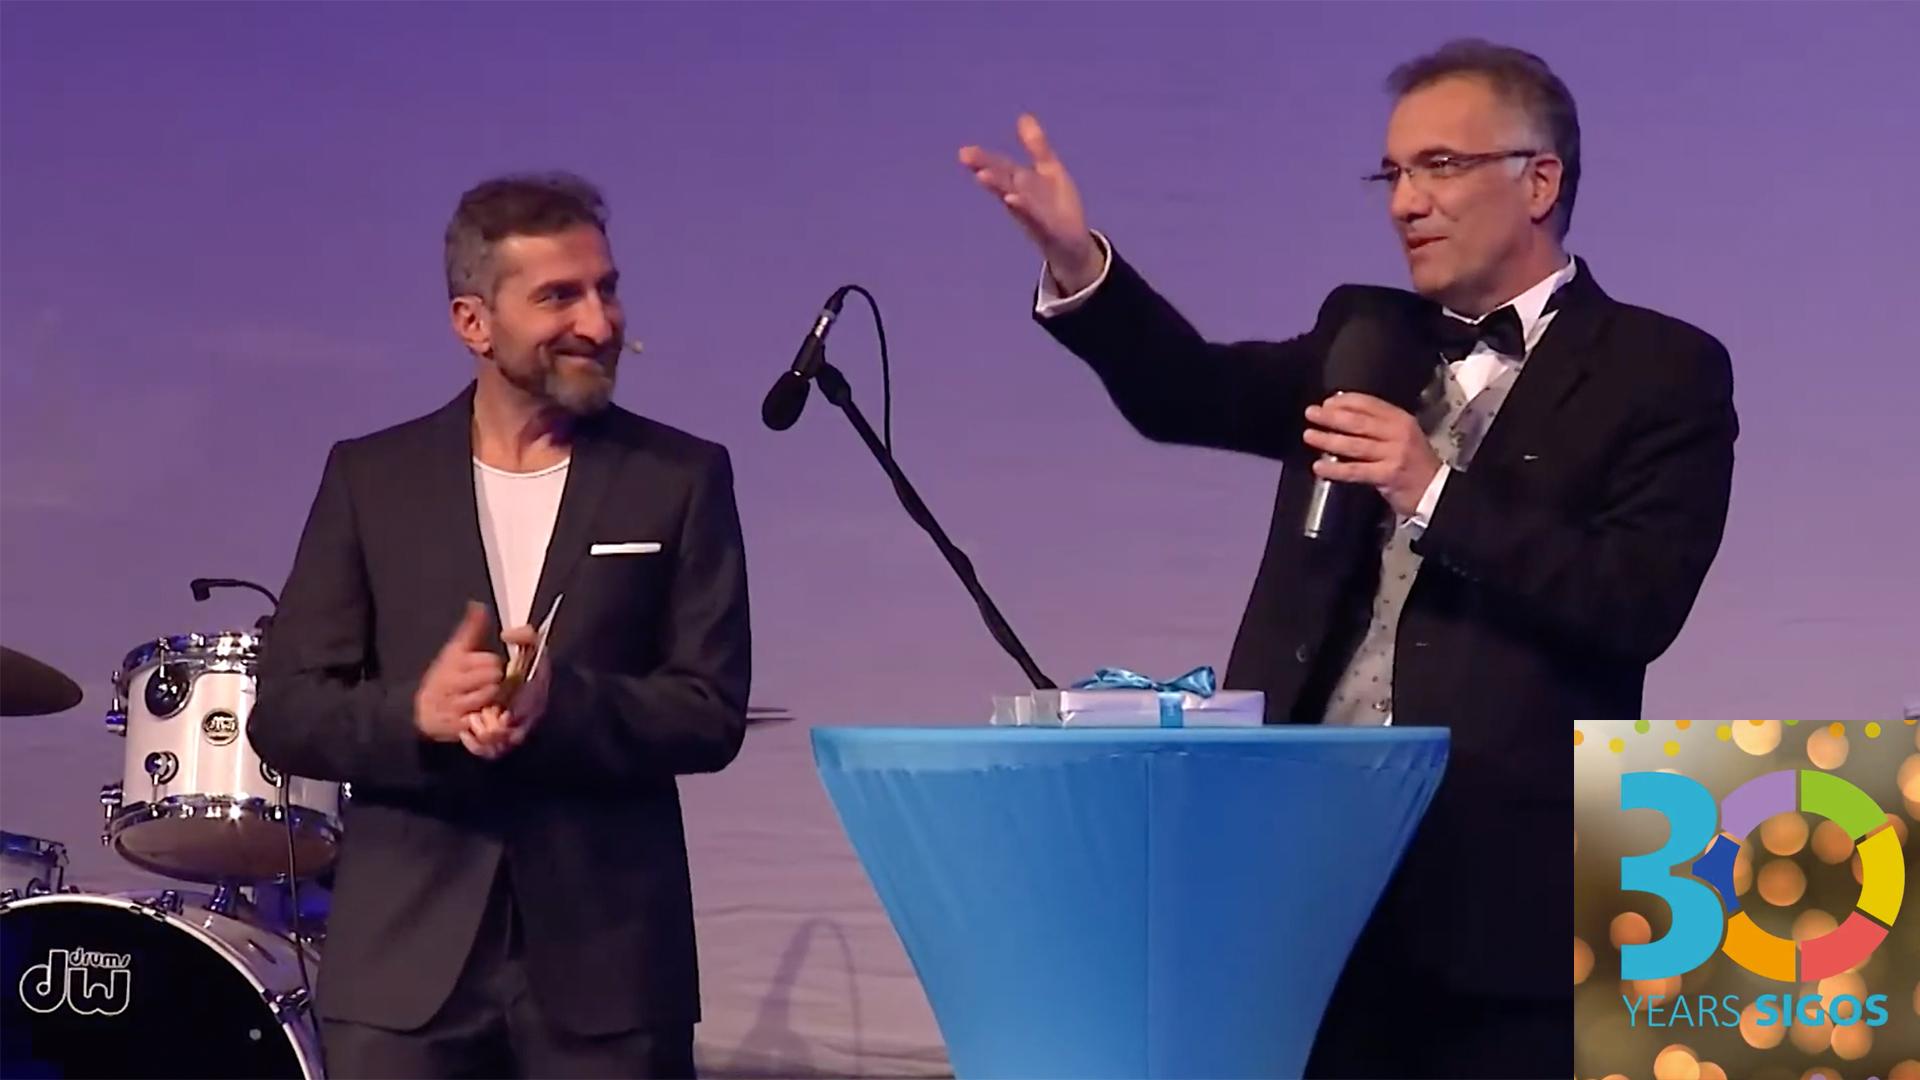 Adil Kaya at 30th anniversary of SIGOS in Nuremberg, Germany, 2020